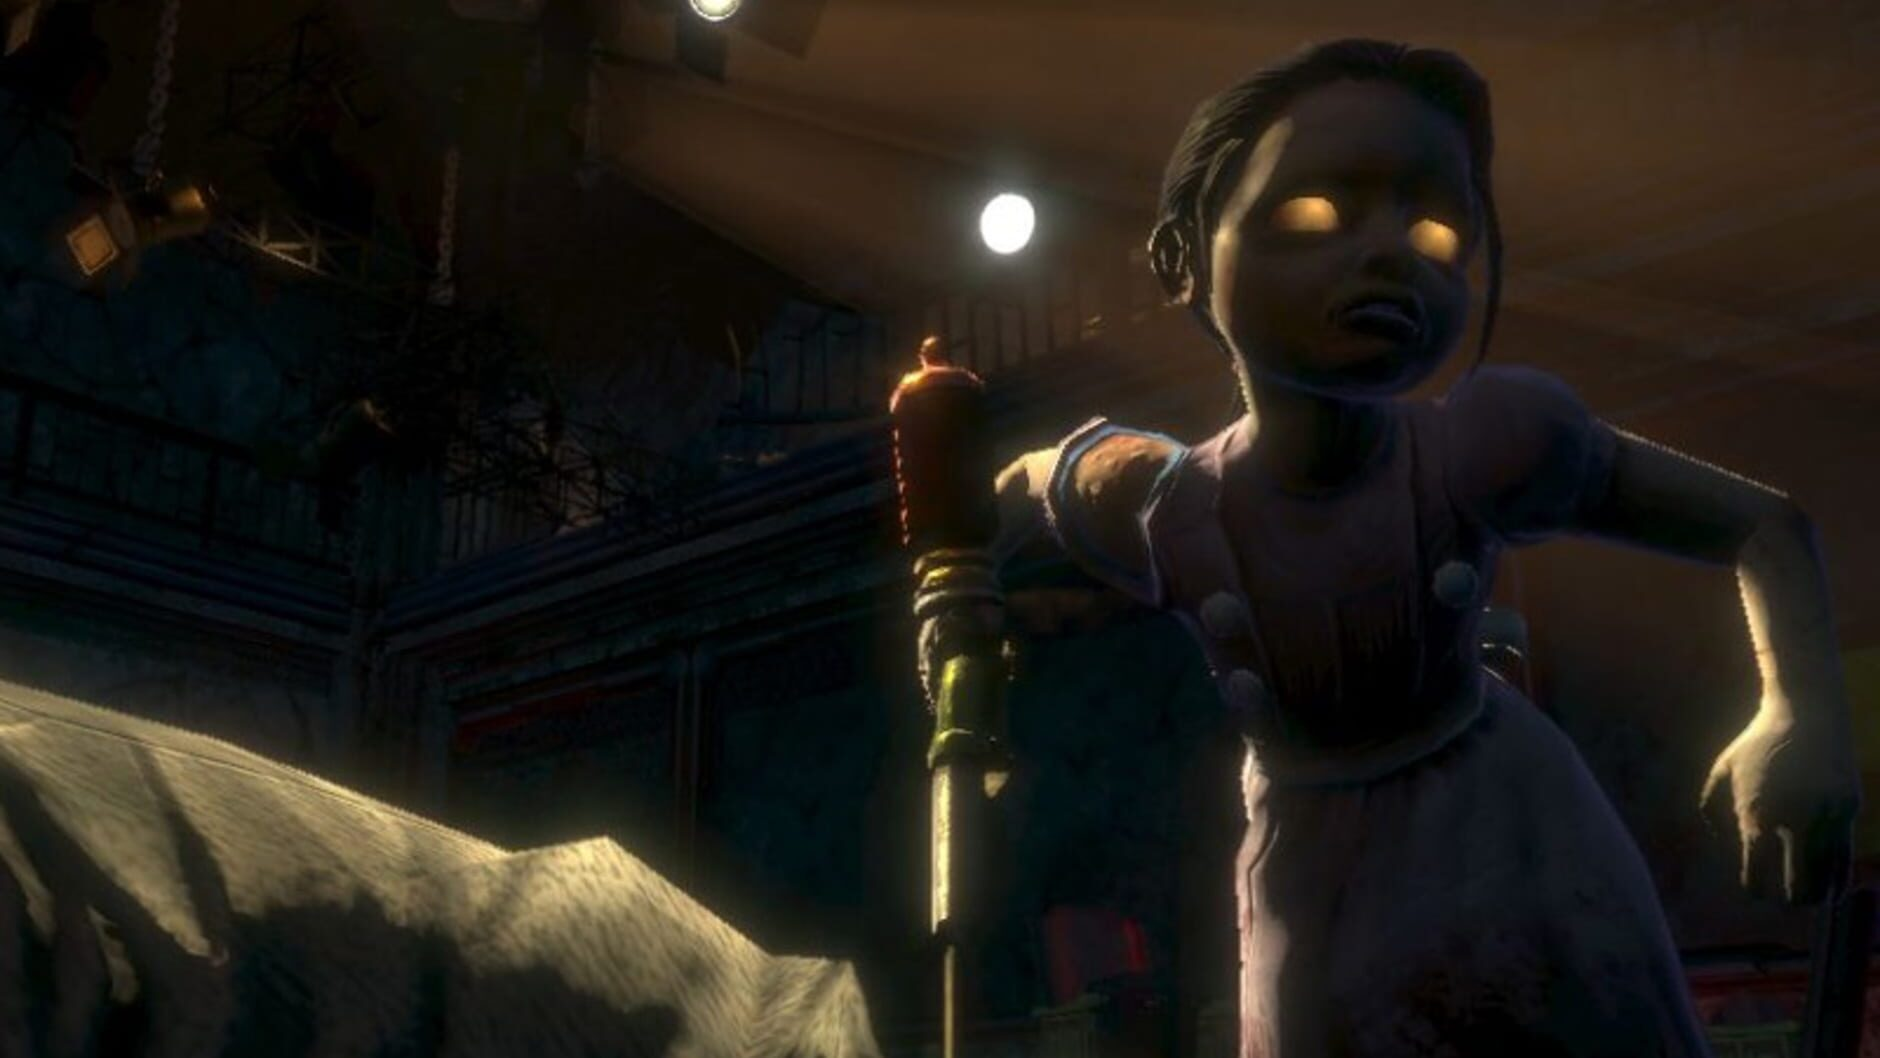 BioShock - 4